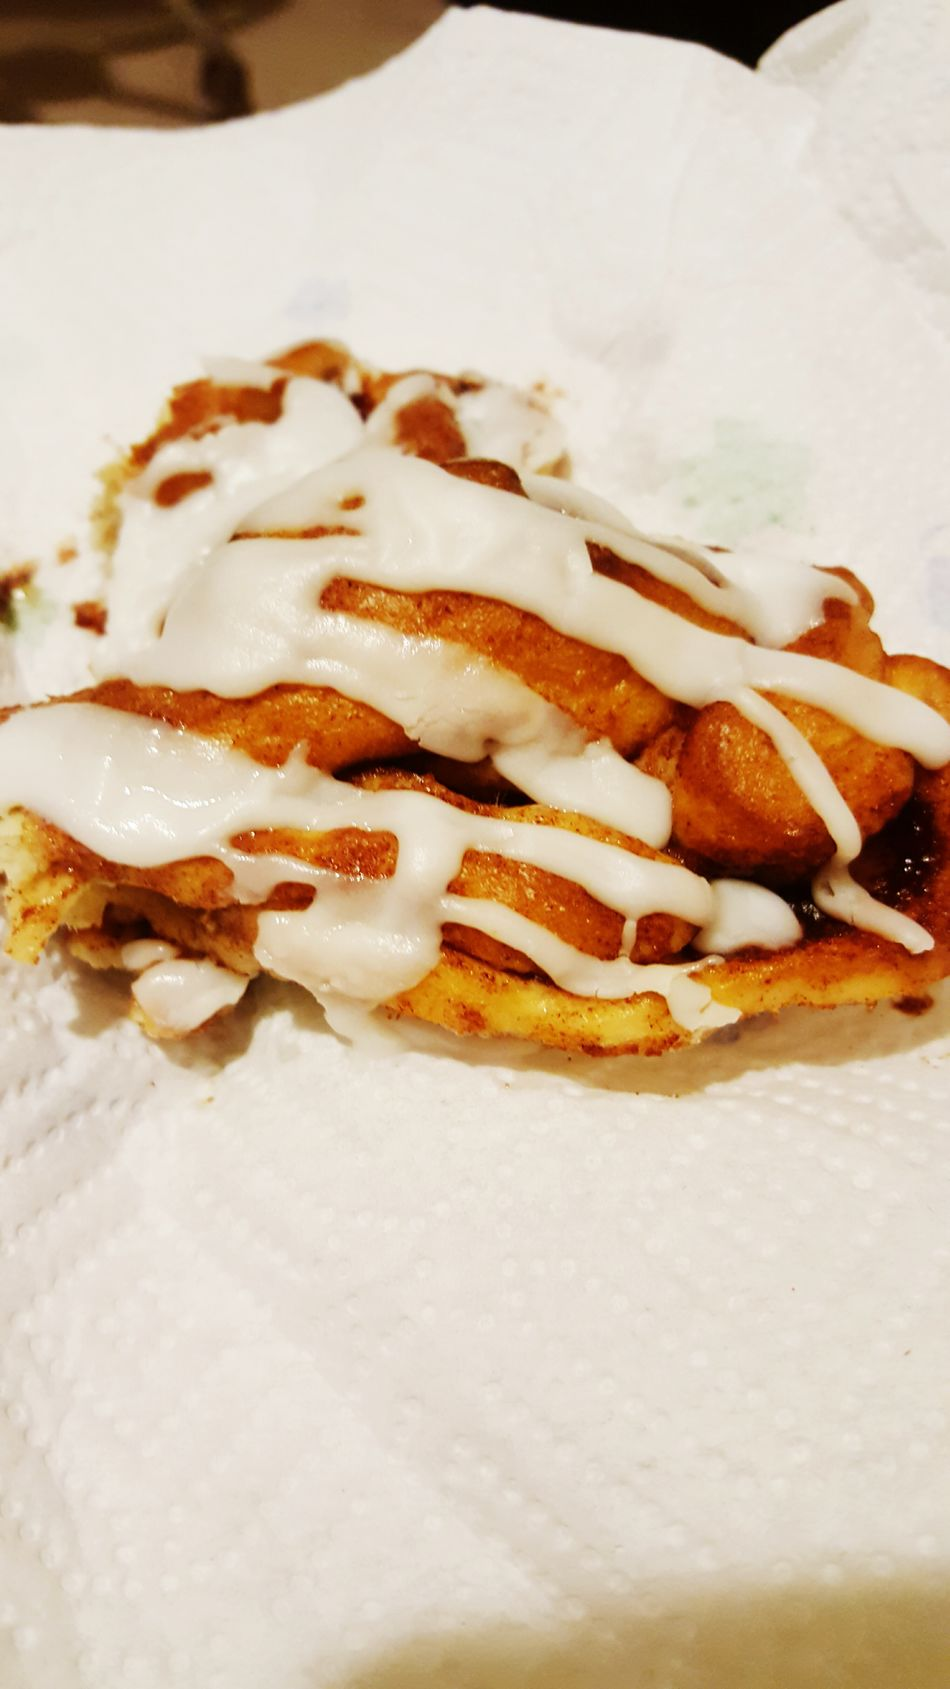 Cinnamon Cinamonroll Sugar Sweet Food Sweet Sweets Indulgent Desserts Dessert Food Food Porn Food And Drink Snacks Foodphotography Foodies